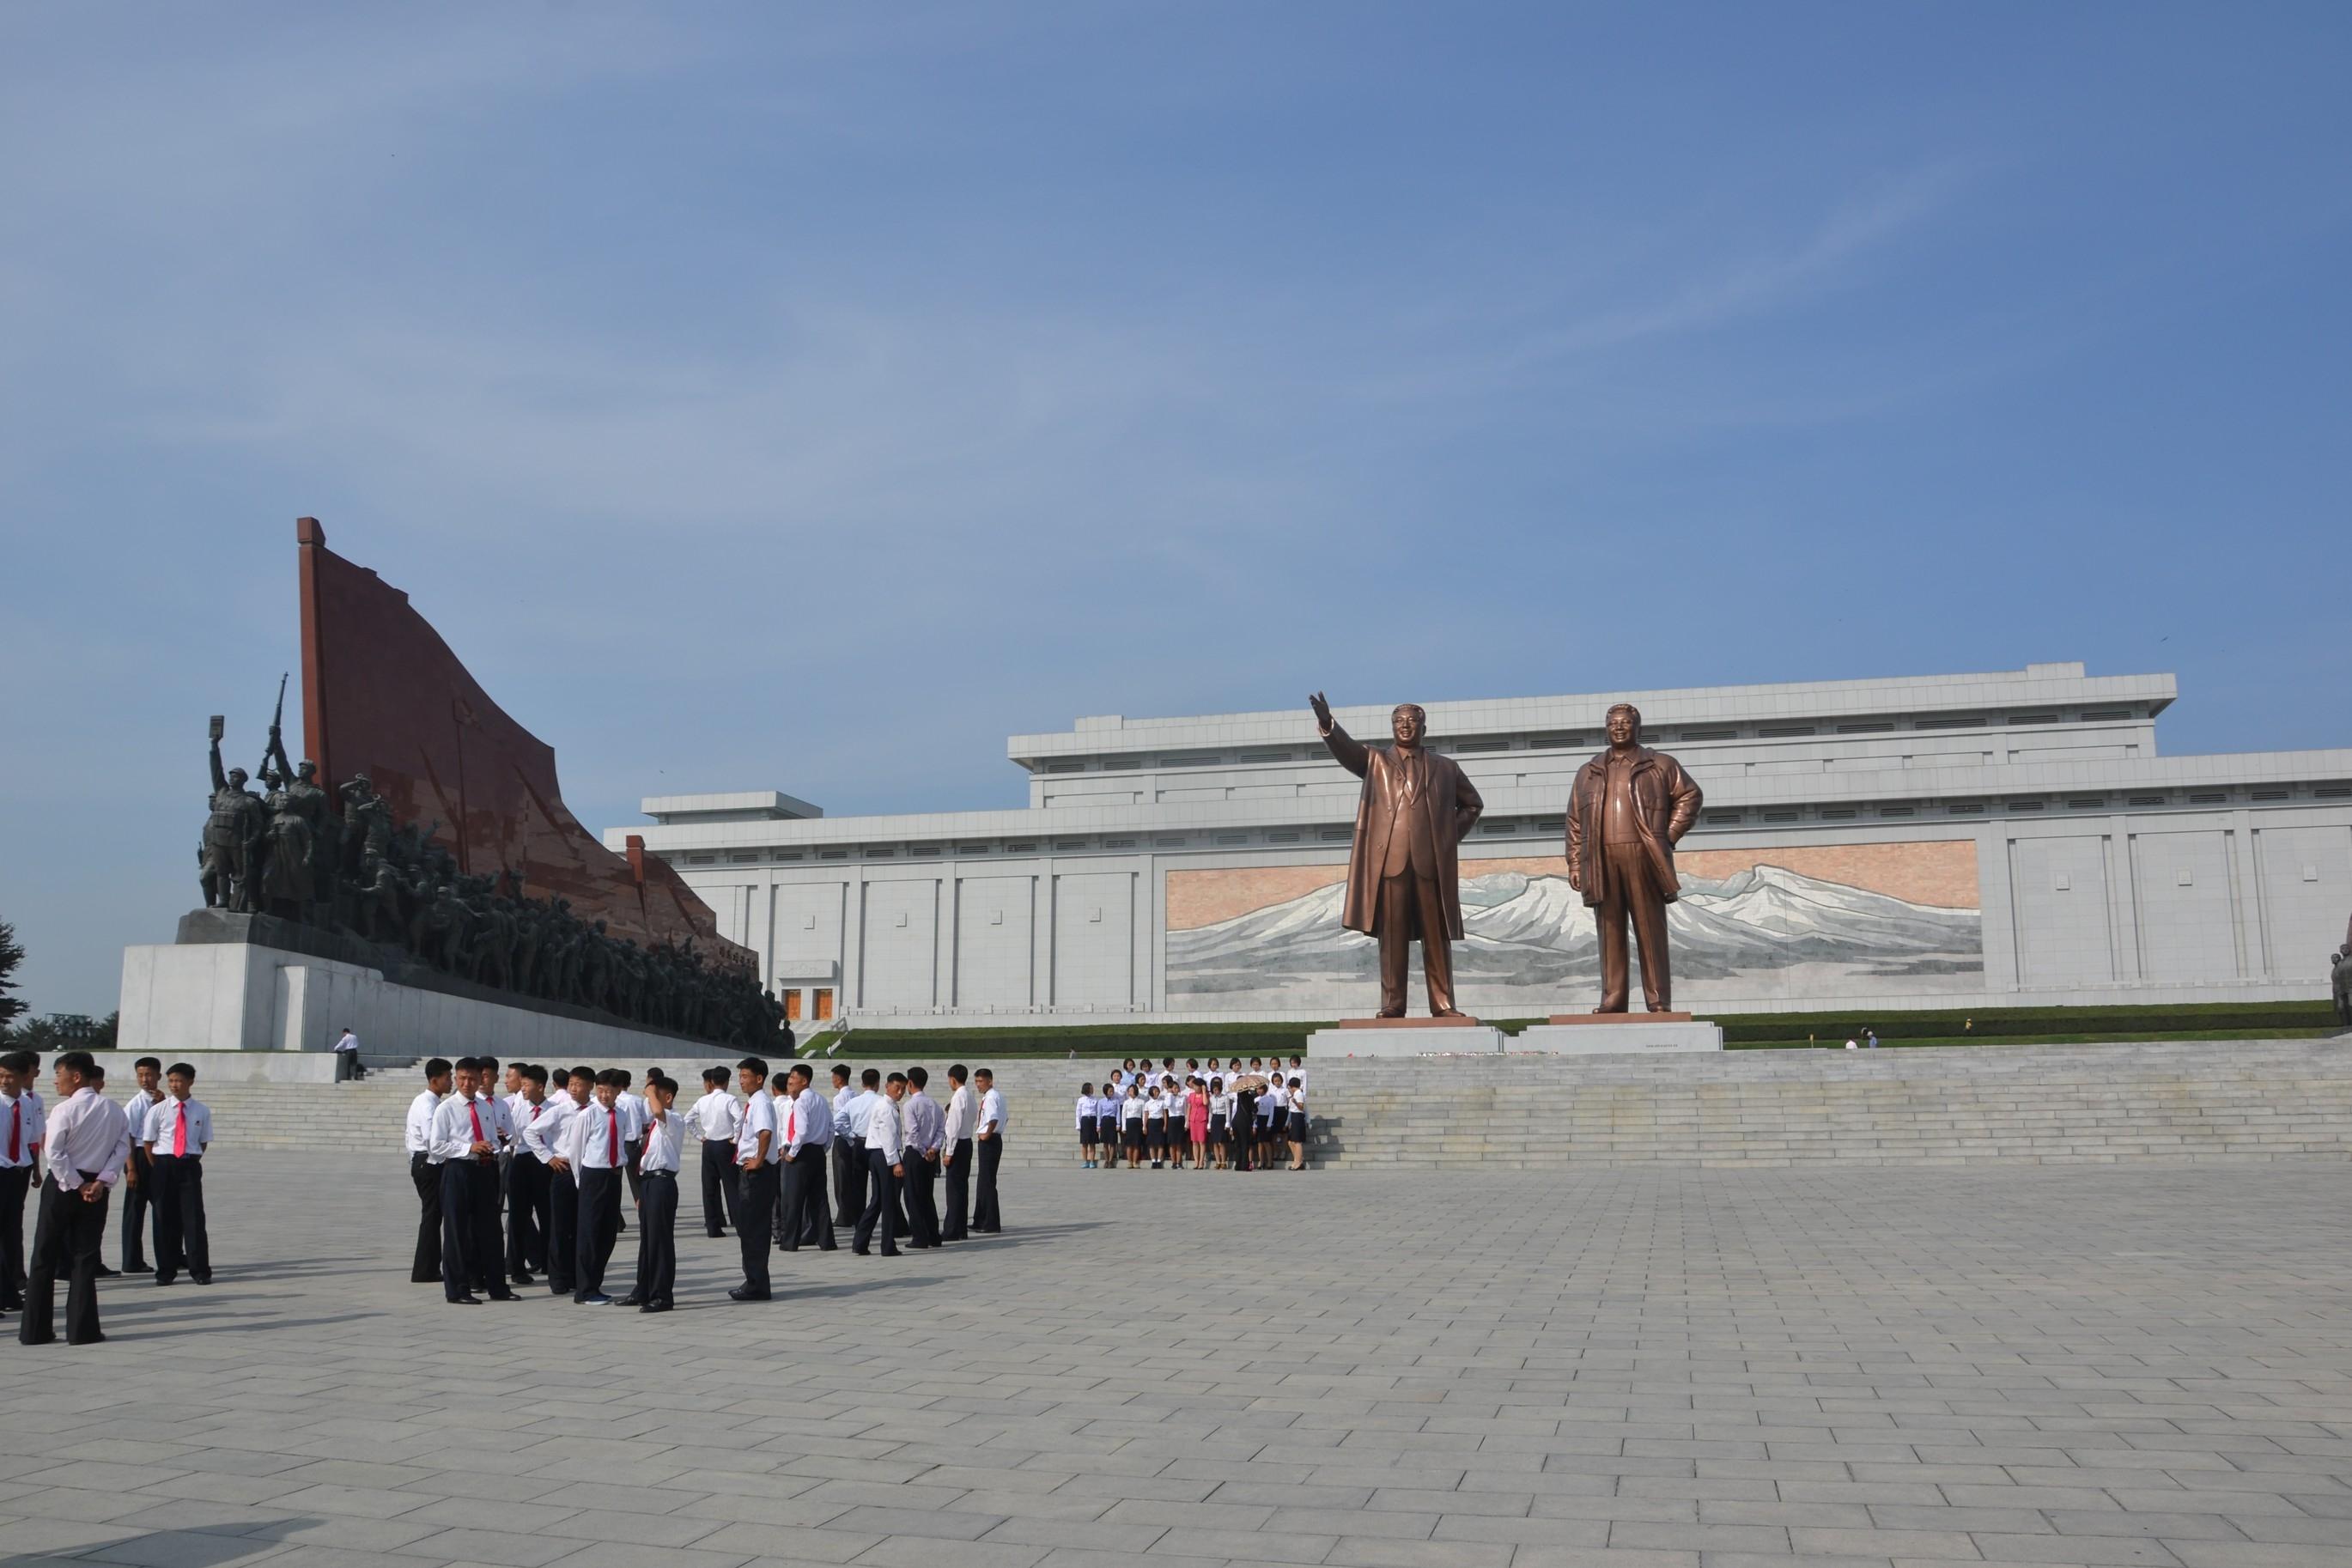 Severní Korea zdroj foto: DK